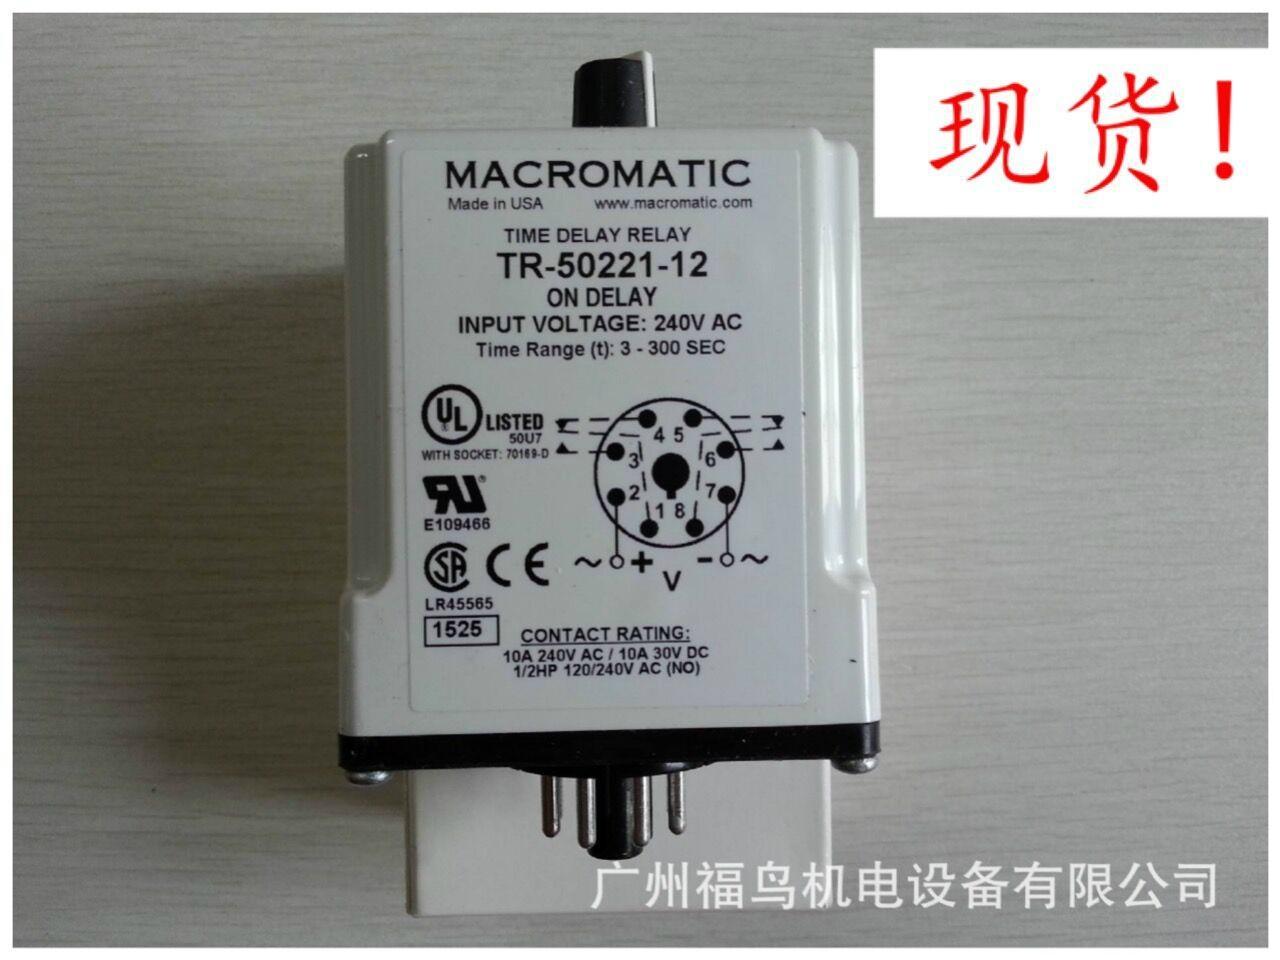 MACROMATIC延时继电器, 型号:TR-50221-12